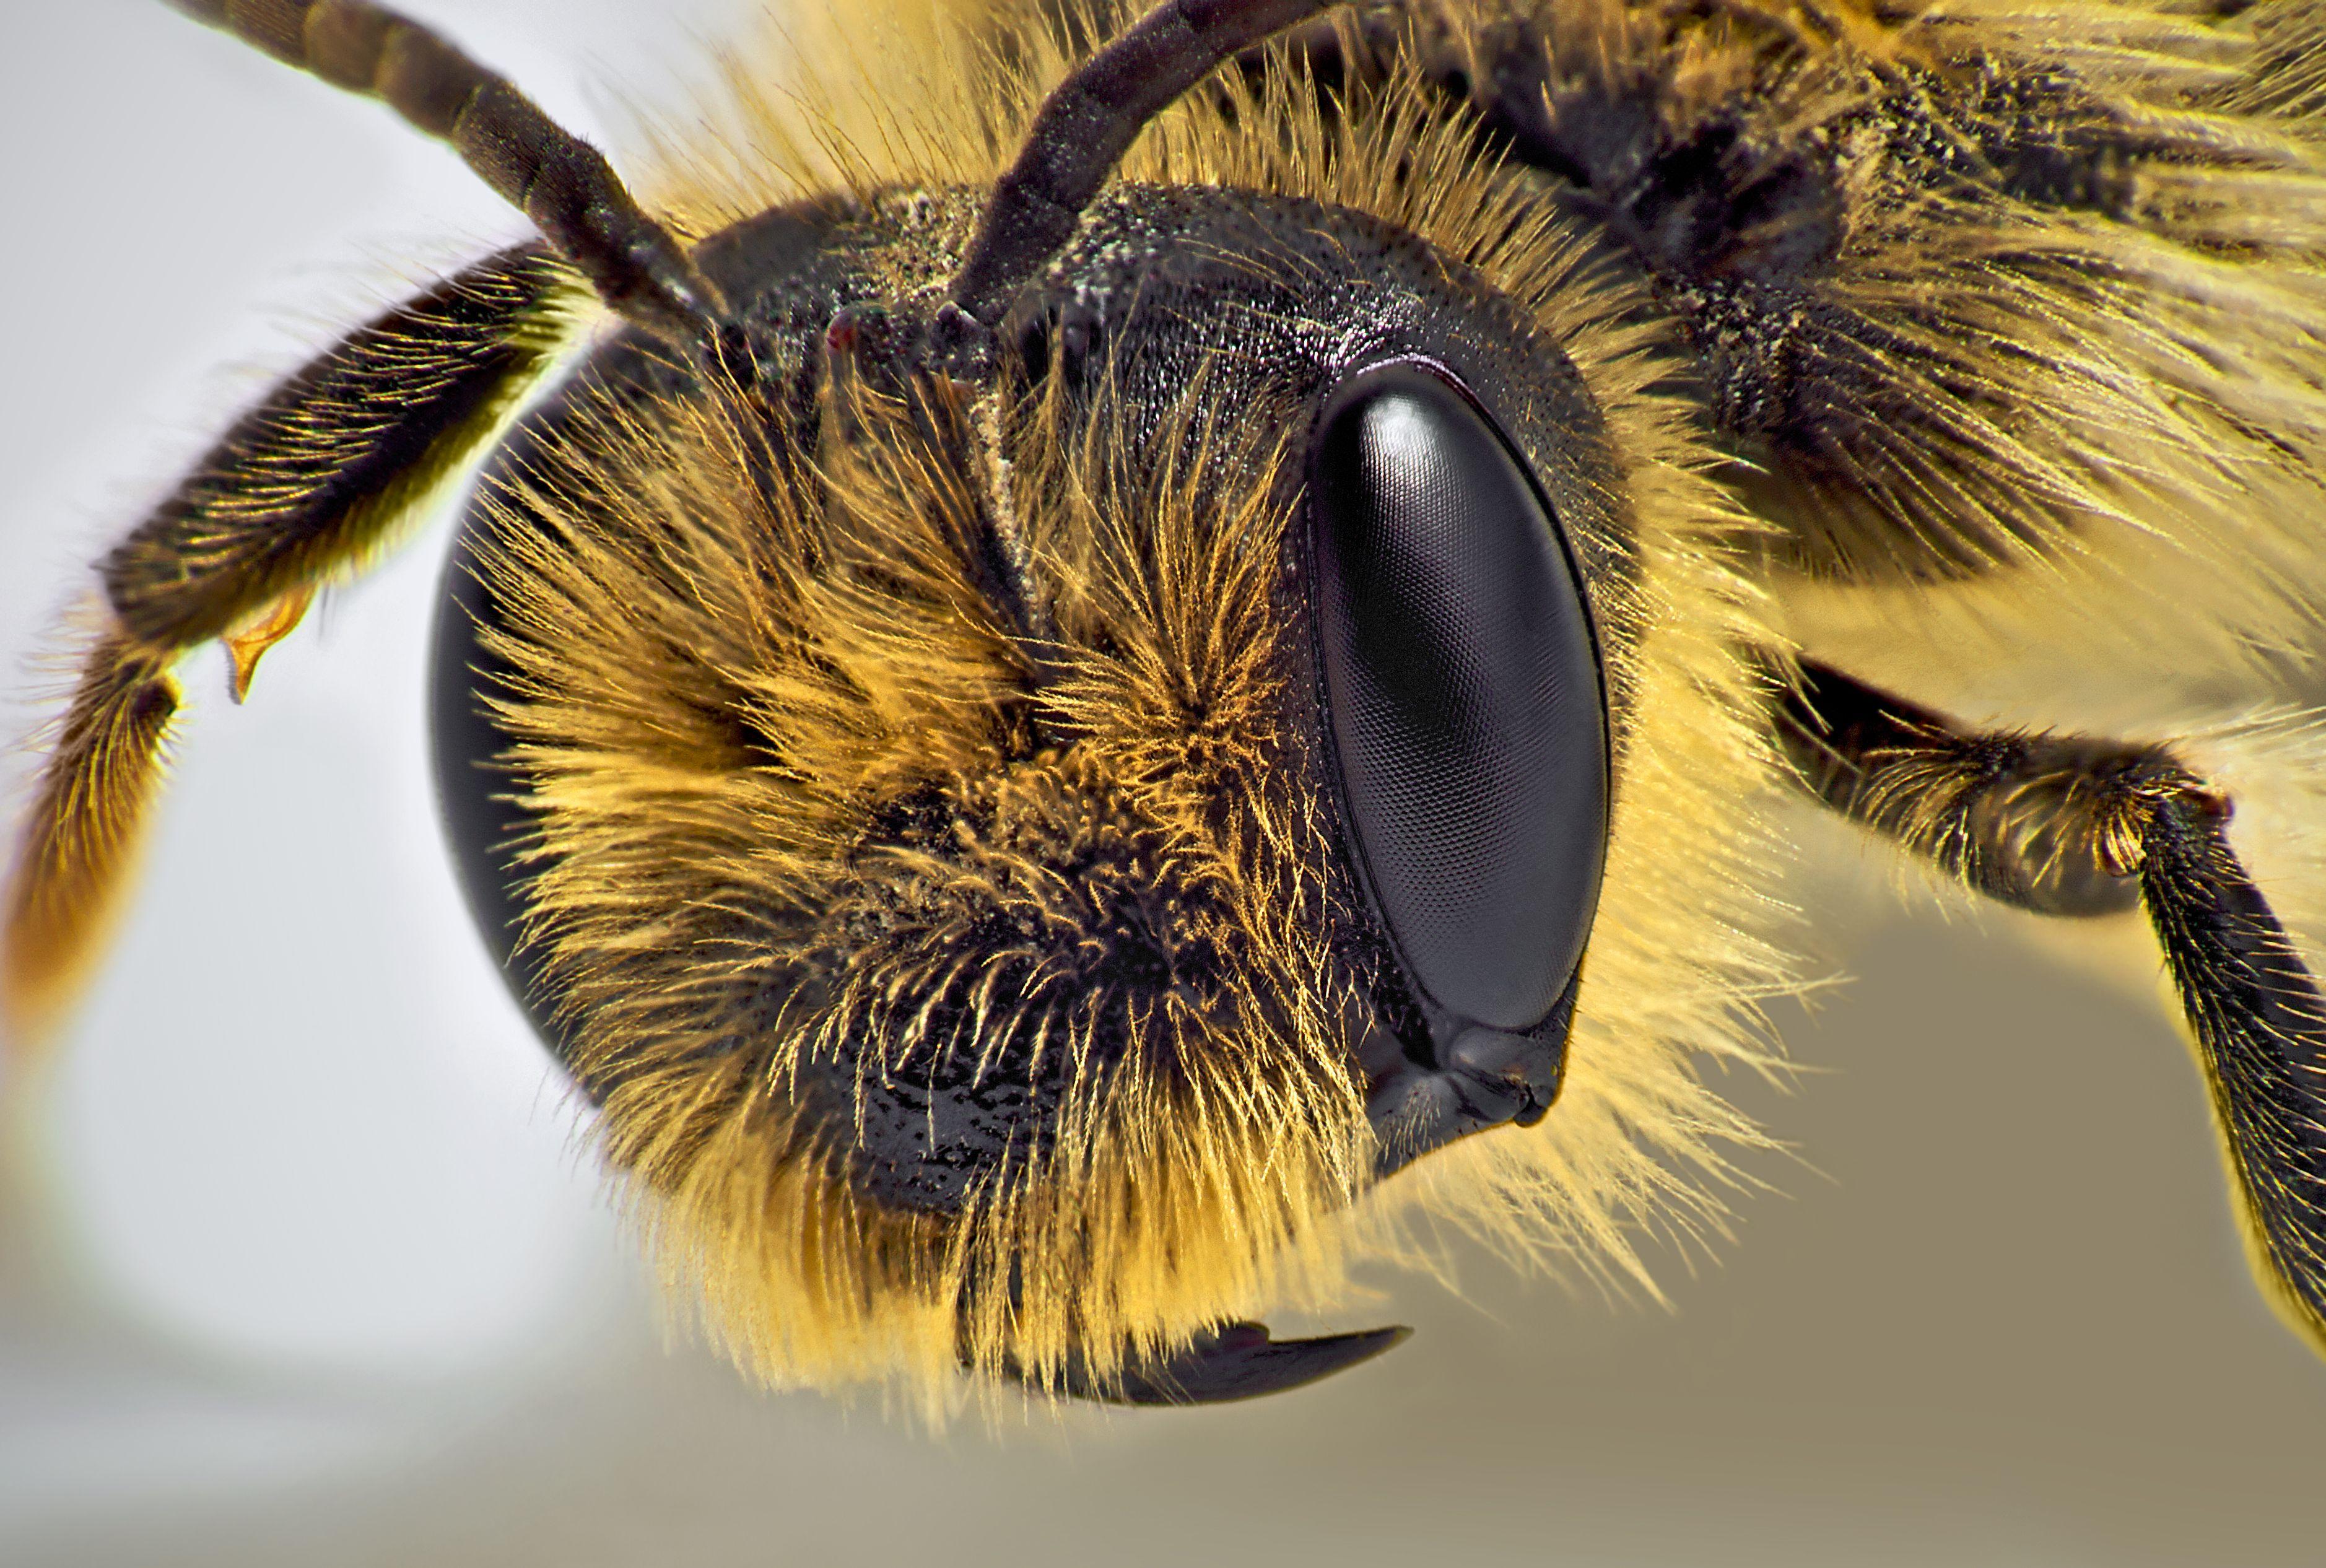 Bee closeup | Sound Bites | Bees | Pinterest | Bees